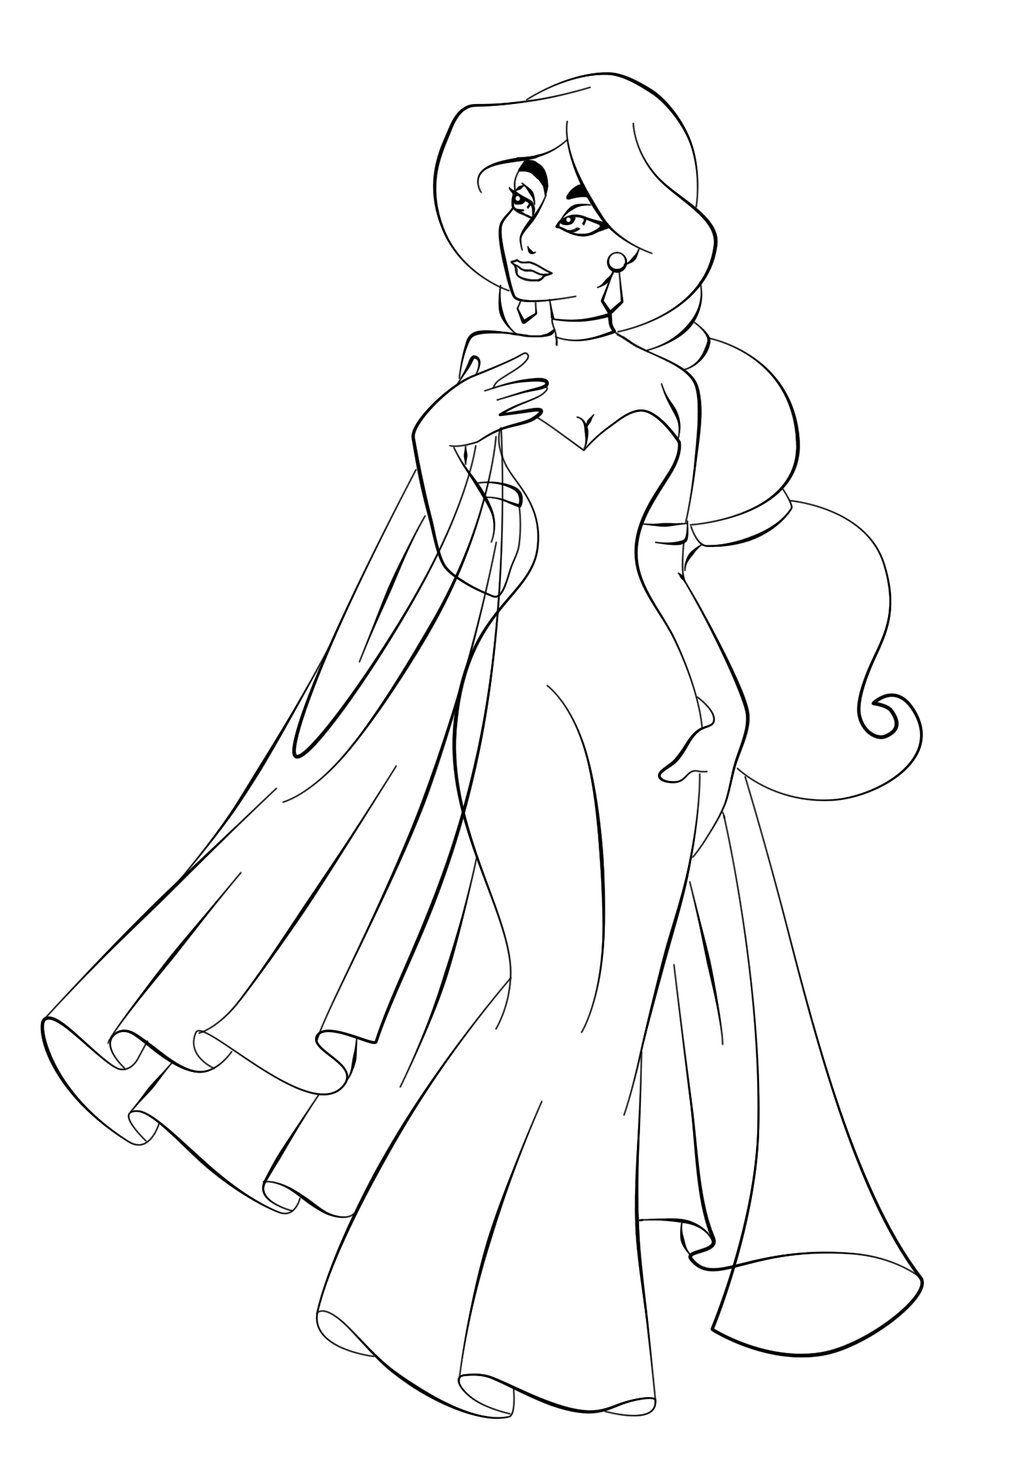 Jasmine In Wedding Dress Disney Princess Coloring Pages Full Size Image Princess Coloring Pages Disney Princess Coloring Pages Disney Princess Colors